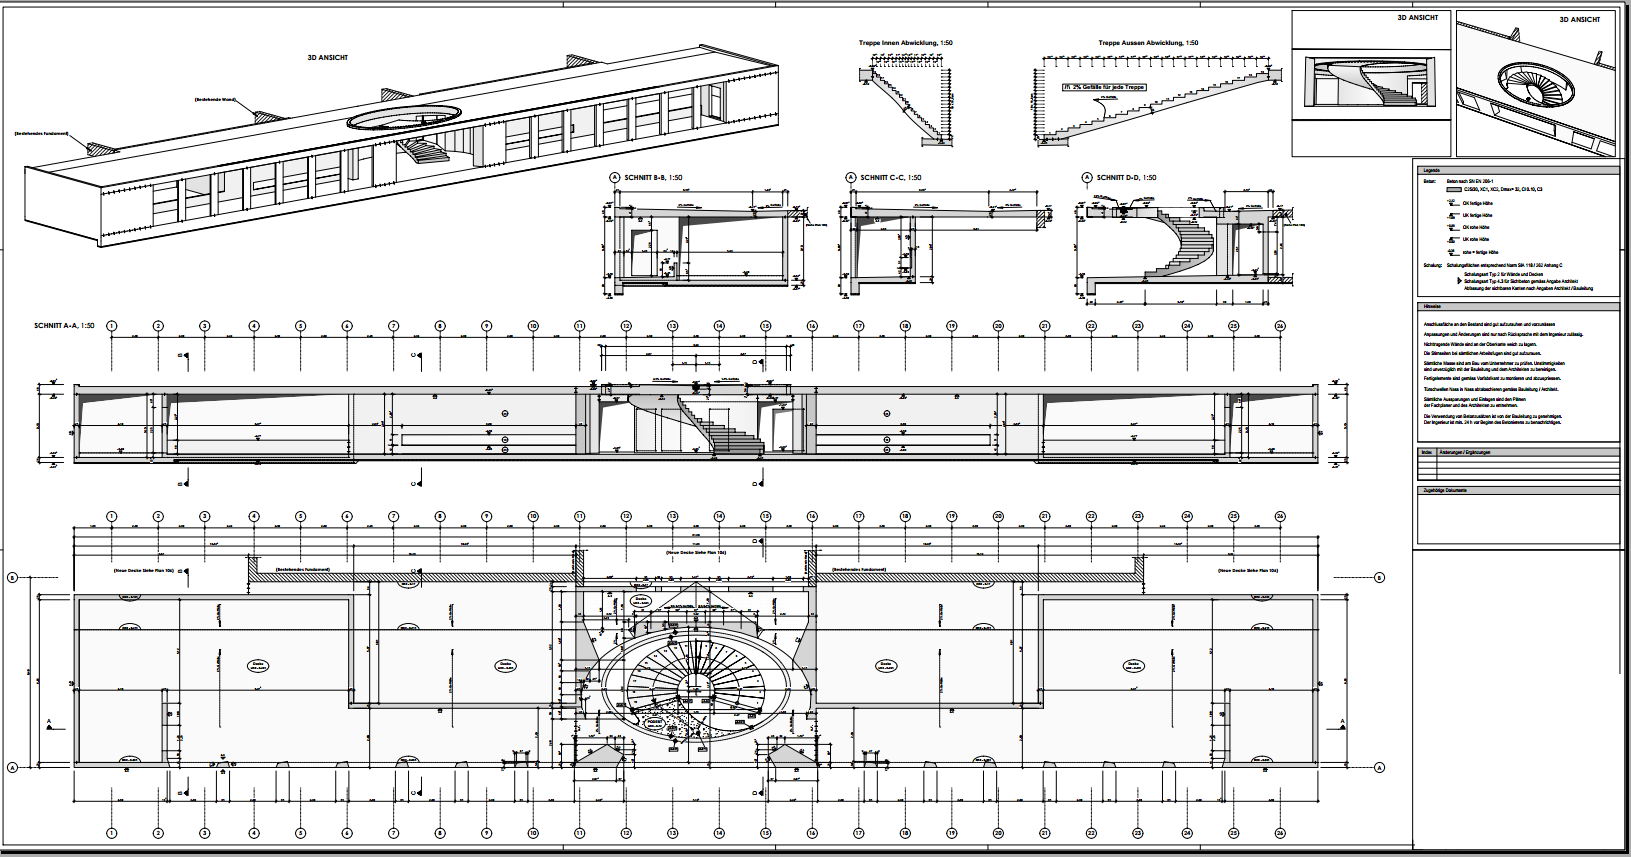 allplan forum ferraillage escalier. Black Bedroom Furniture Sets. Home Design Ideas